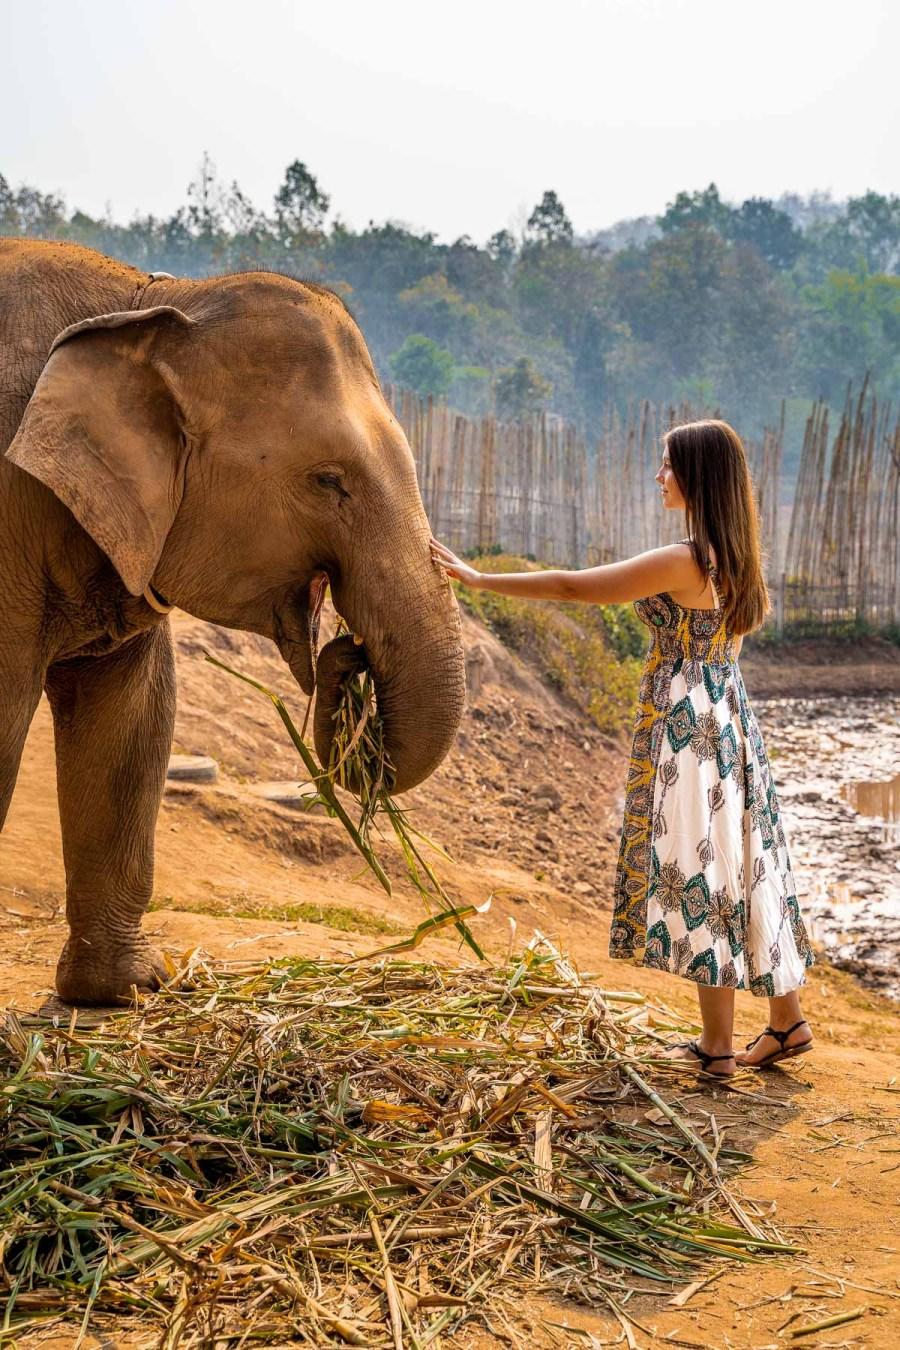 Girl feeding an elephant at Elephant Jungle Sanctuary Chiang Mai